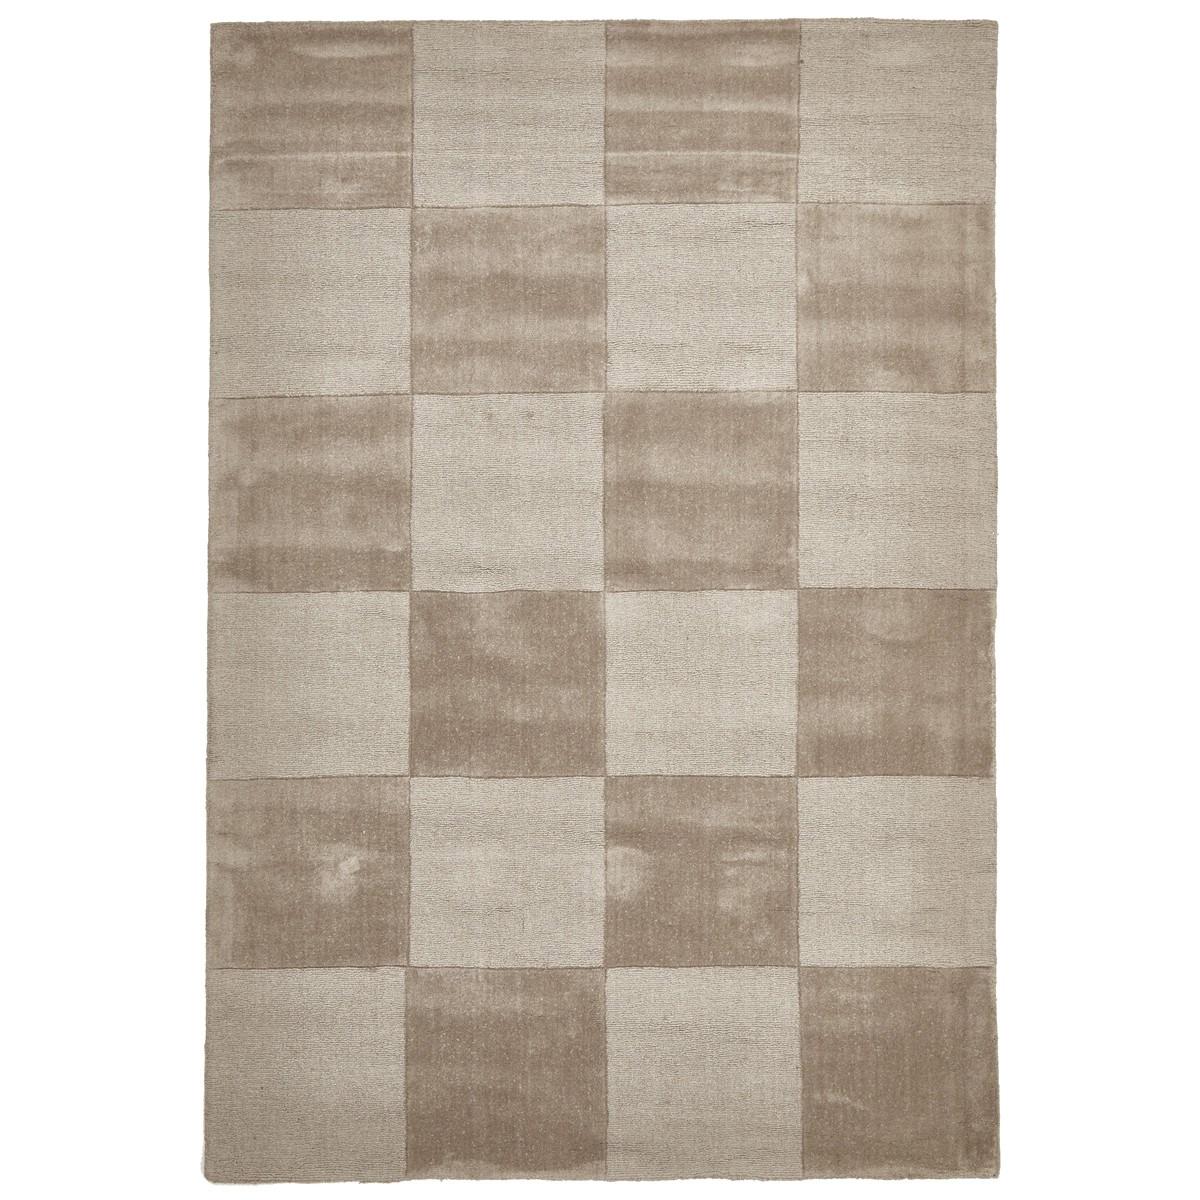 Evangeline Hand Loomed Modern Wool Rug, 165x115cm, Taupe